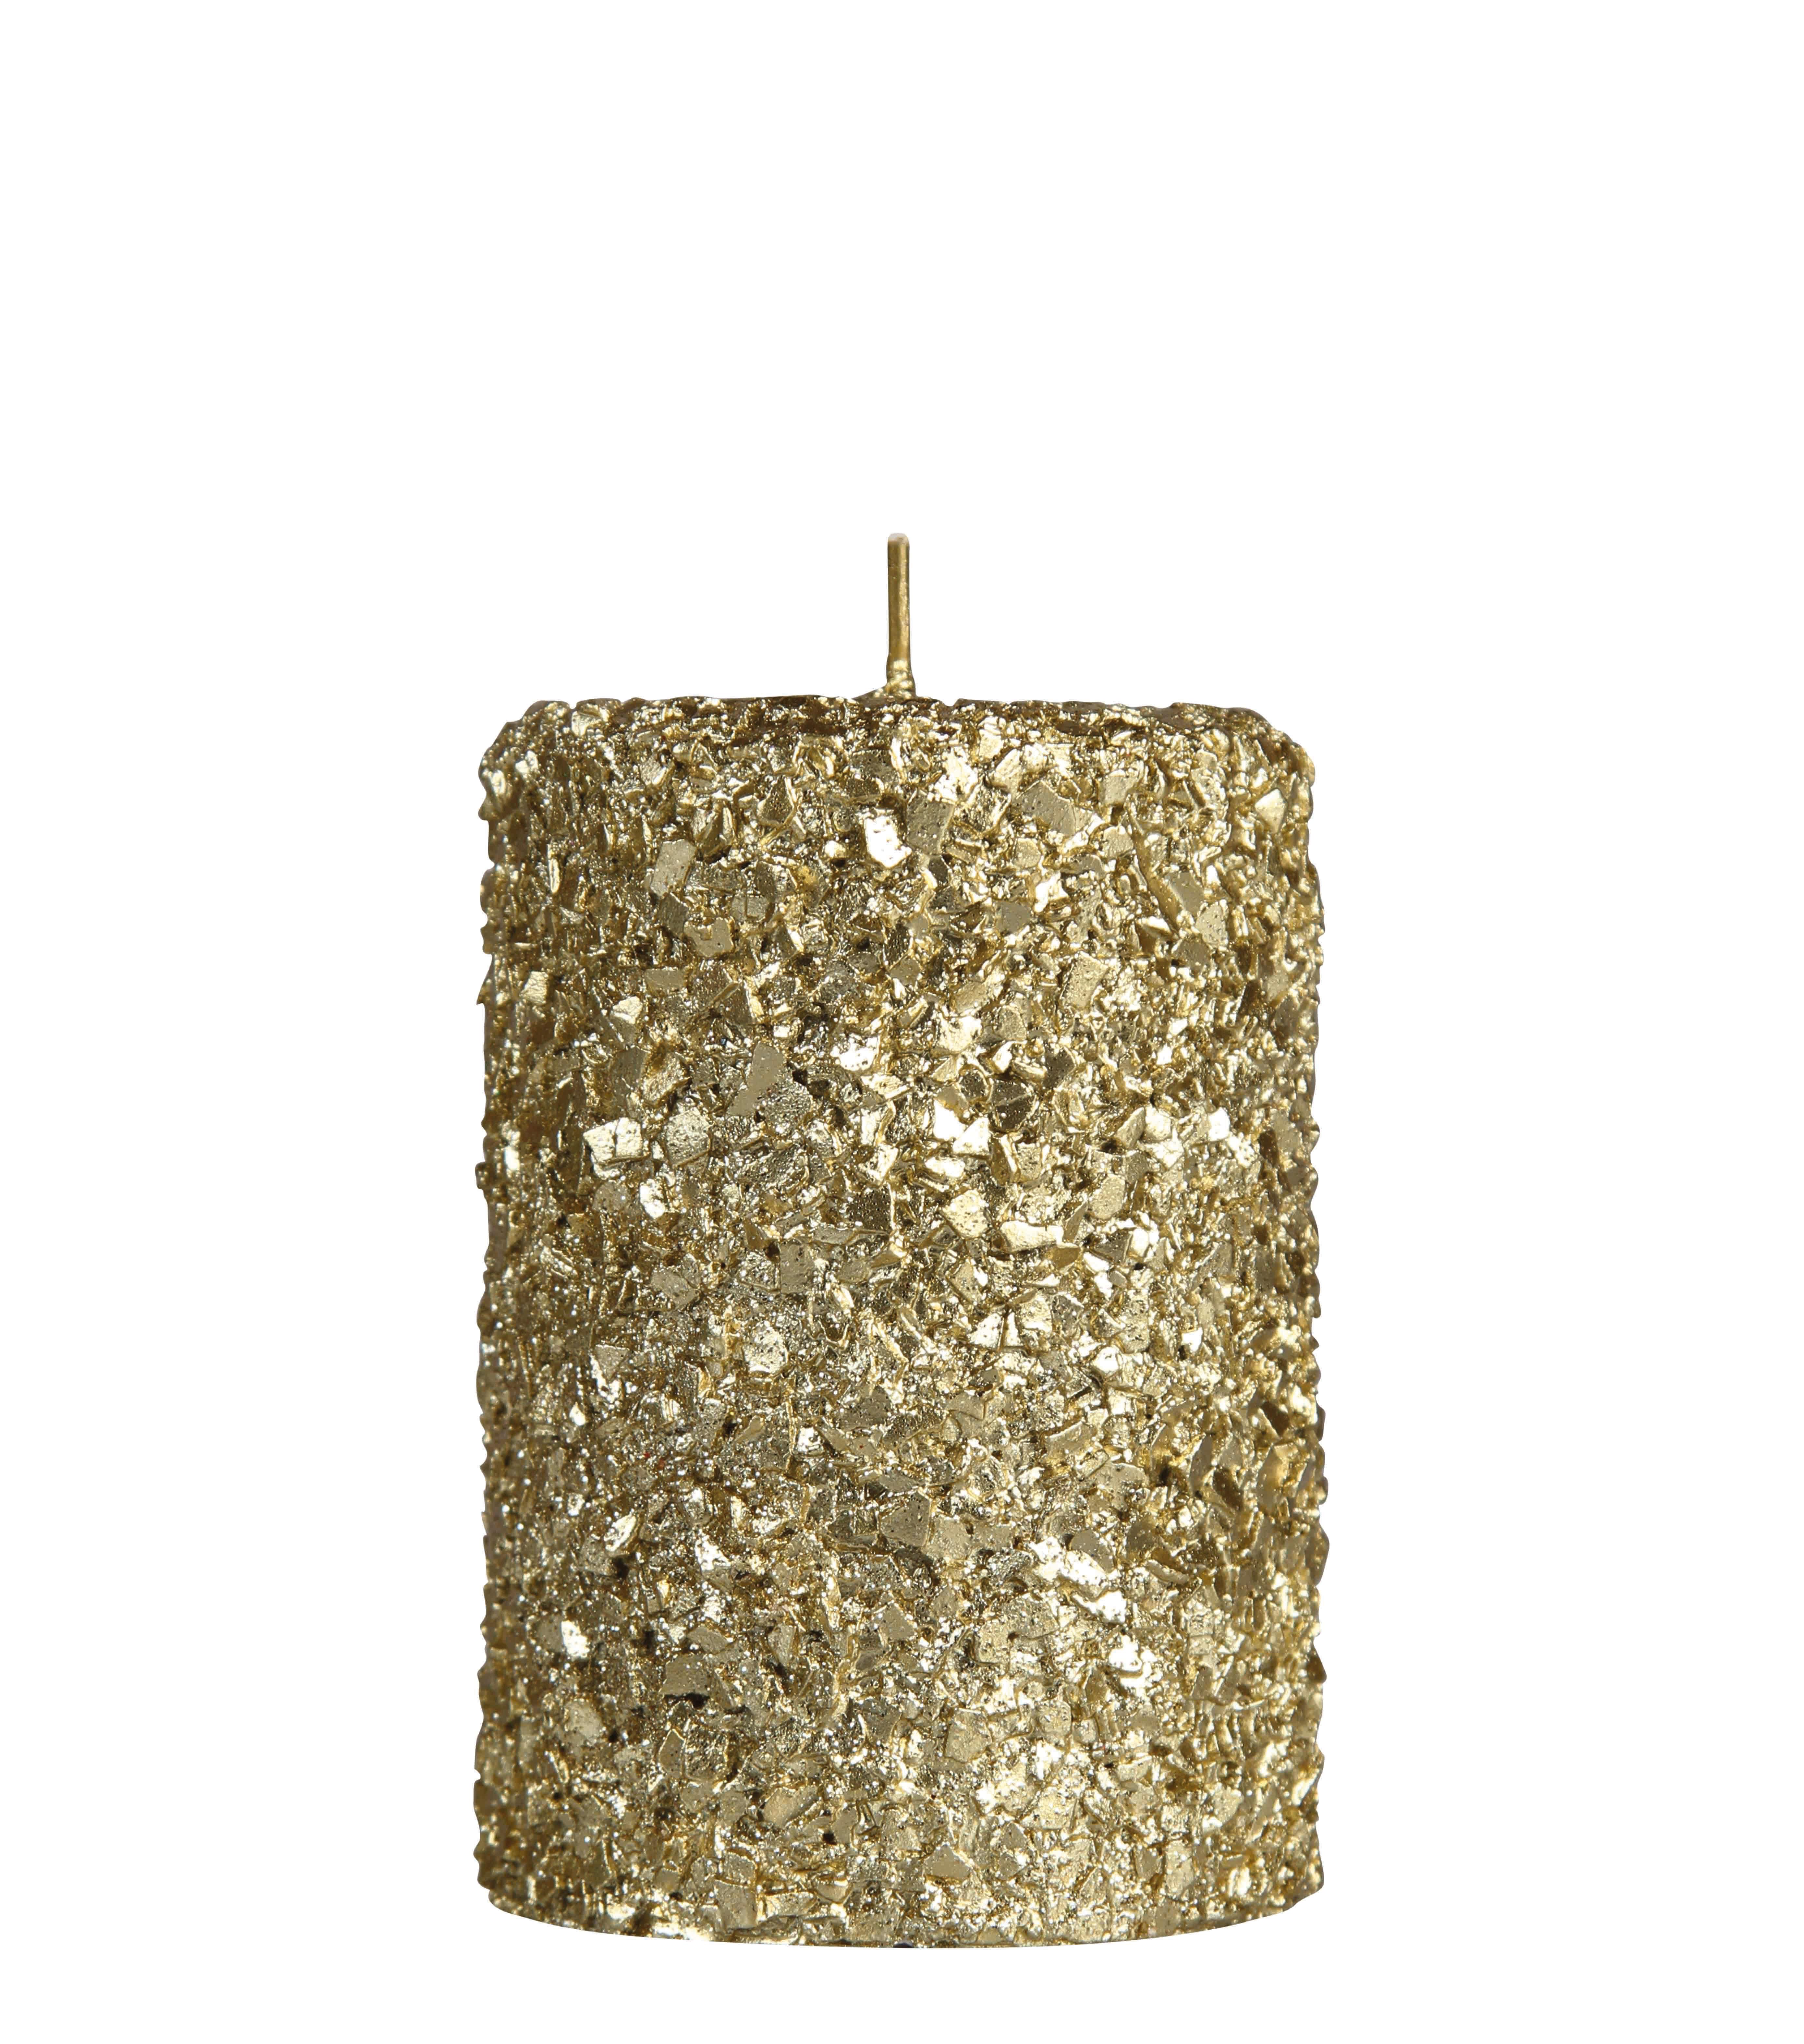 Déco - Bougeoirs, photophores - Bougie Pillar / Small - H 10 cm - & klevering - Small / Or pailleté - Cire